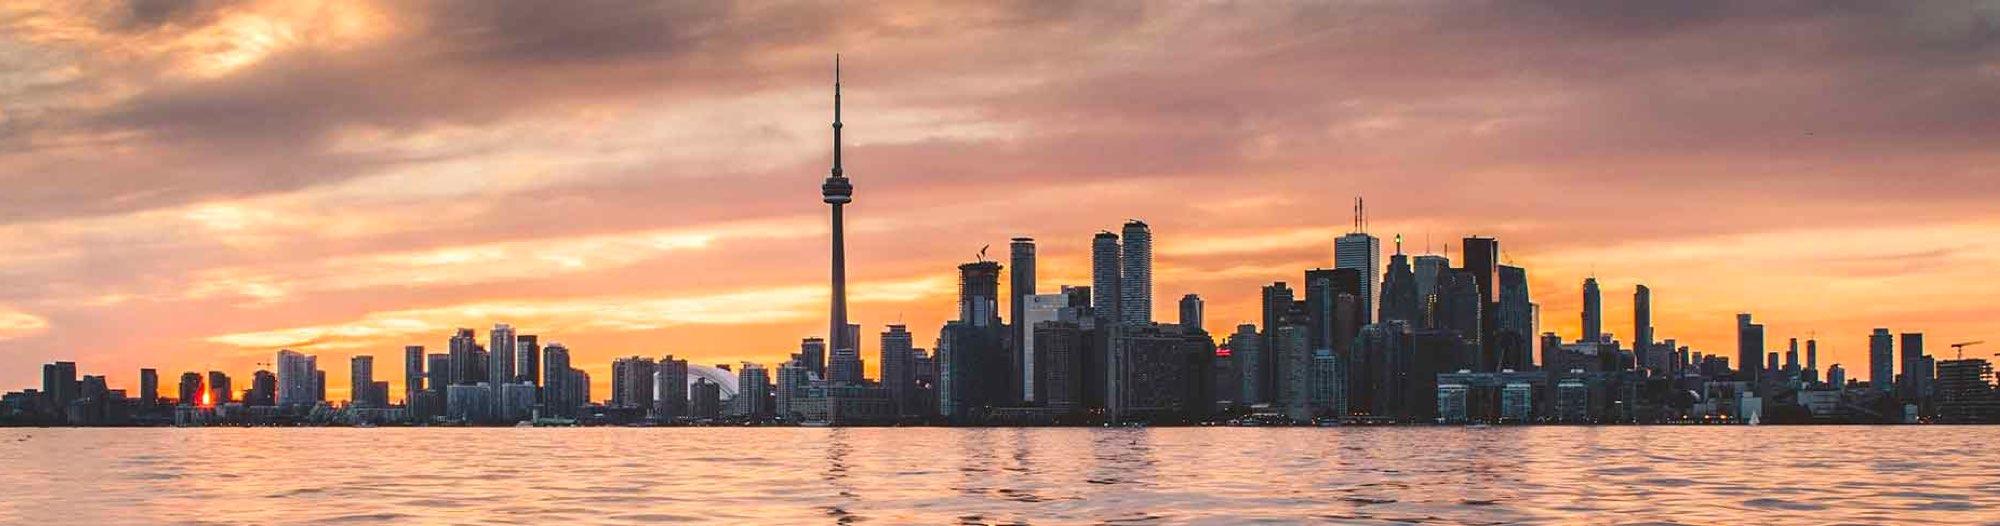 VueConf Toronto 2018